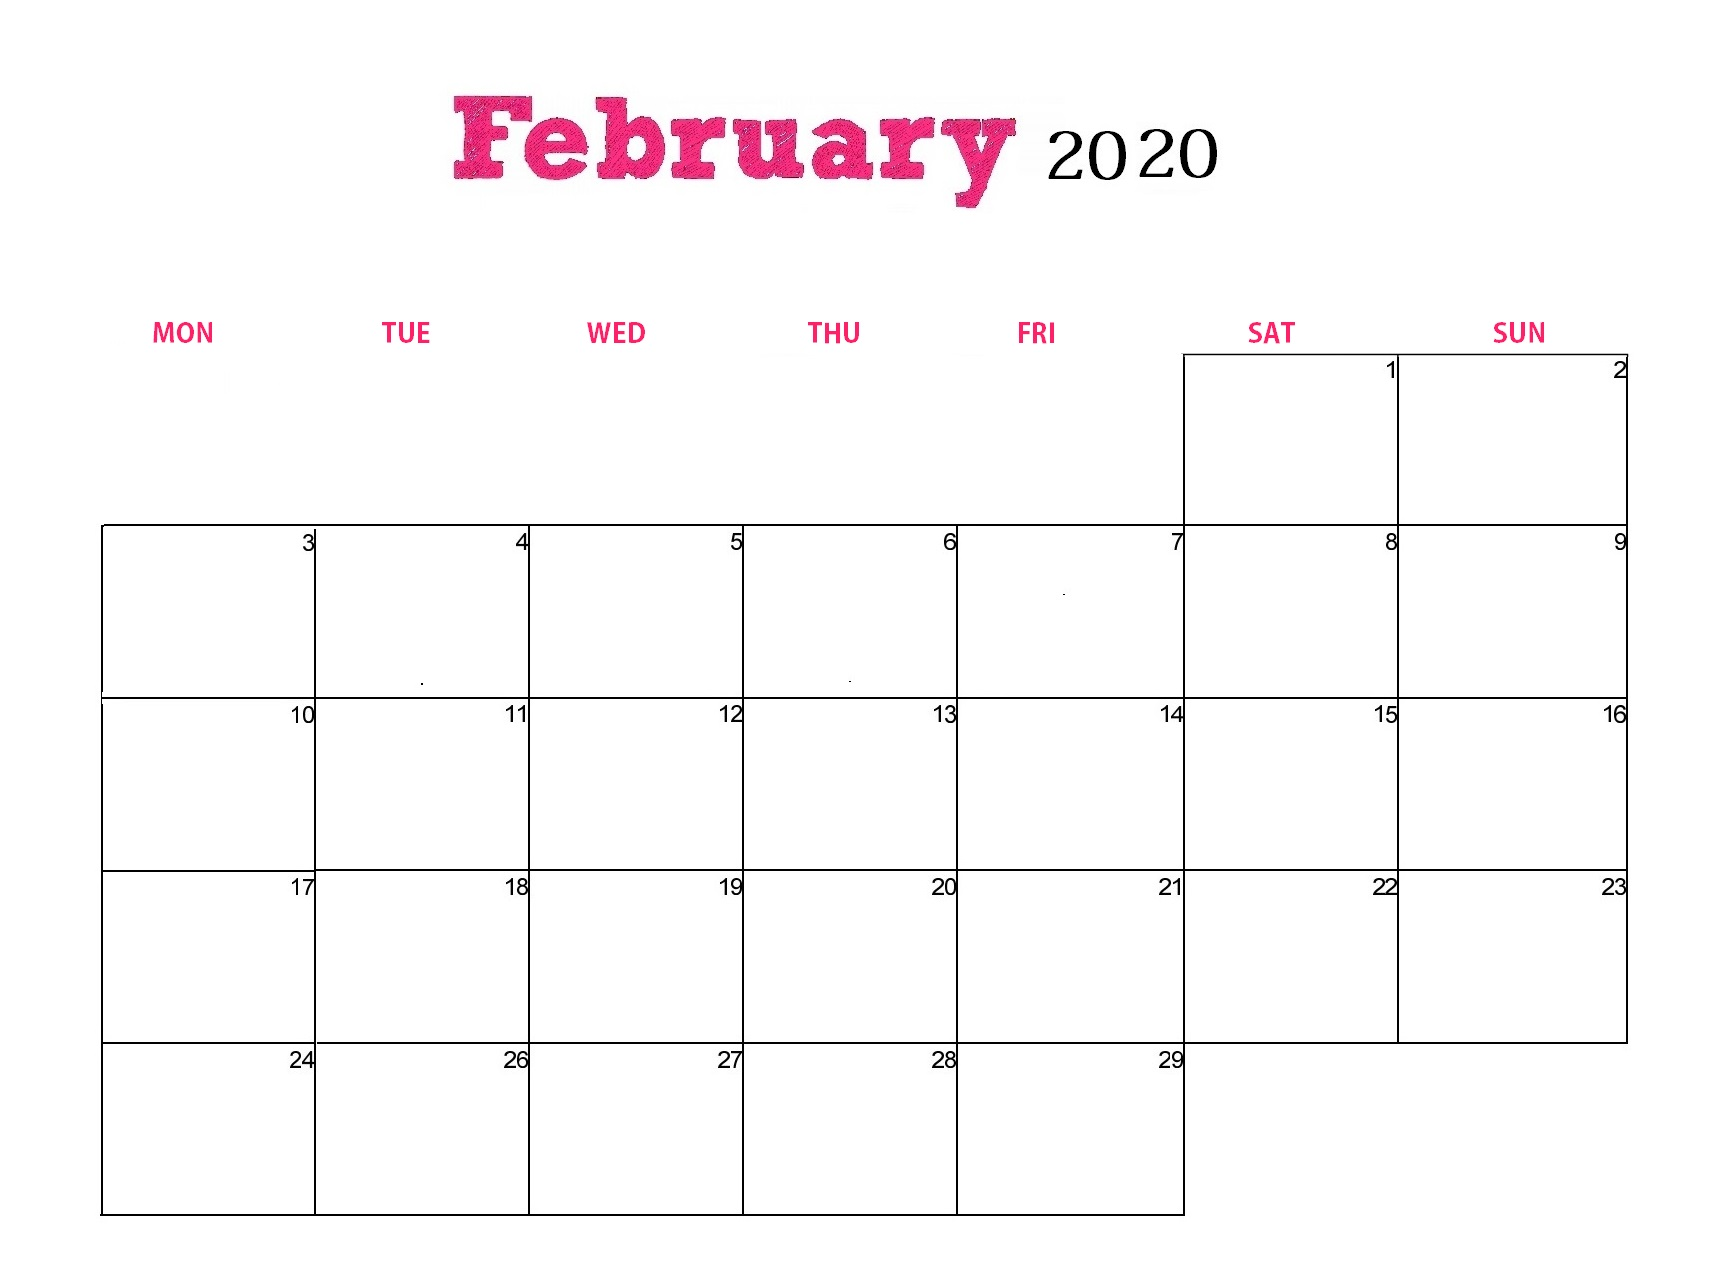 Free February 2020 Calendar Template